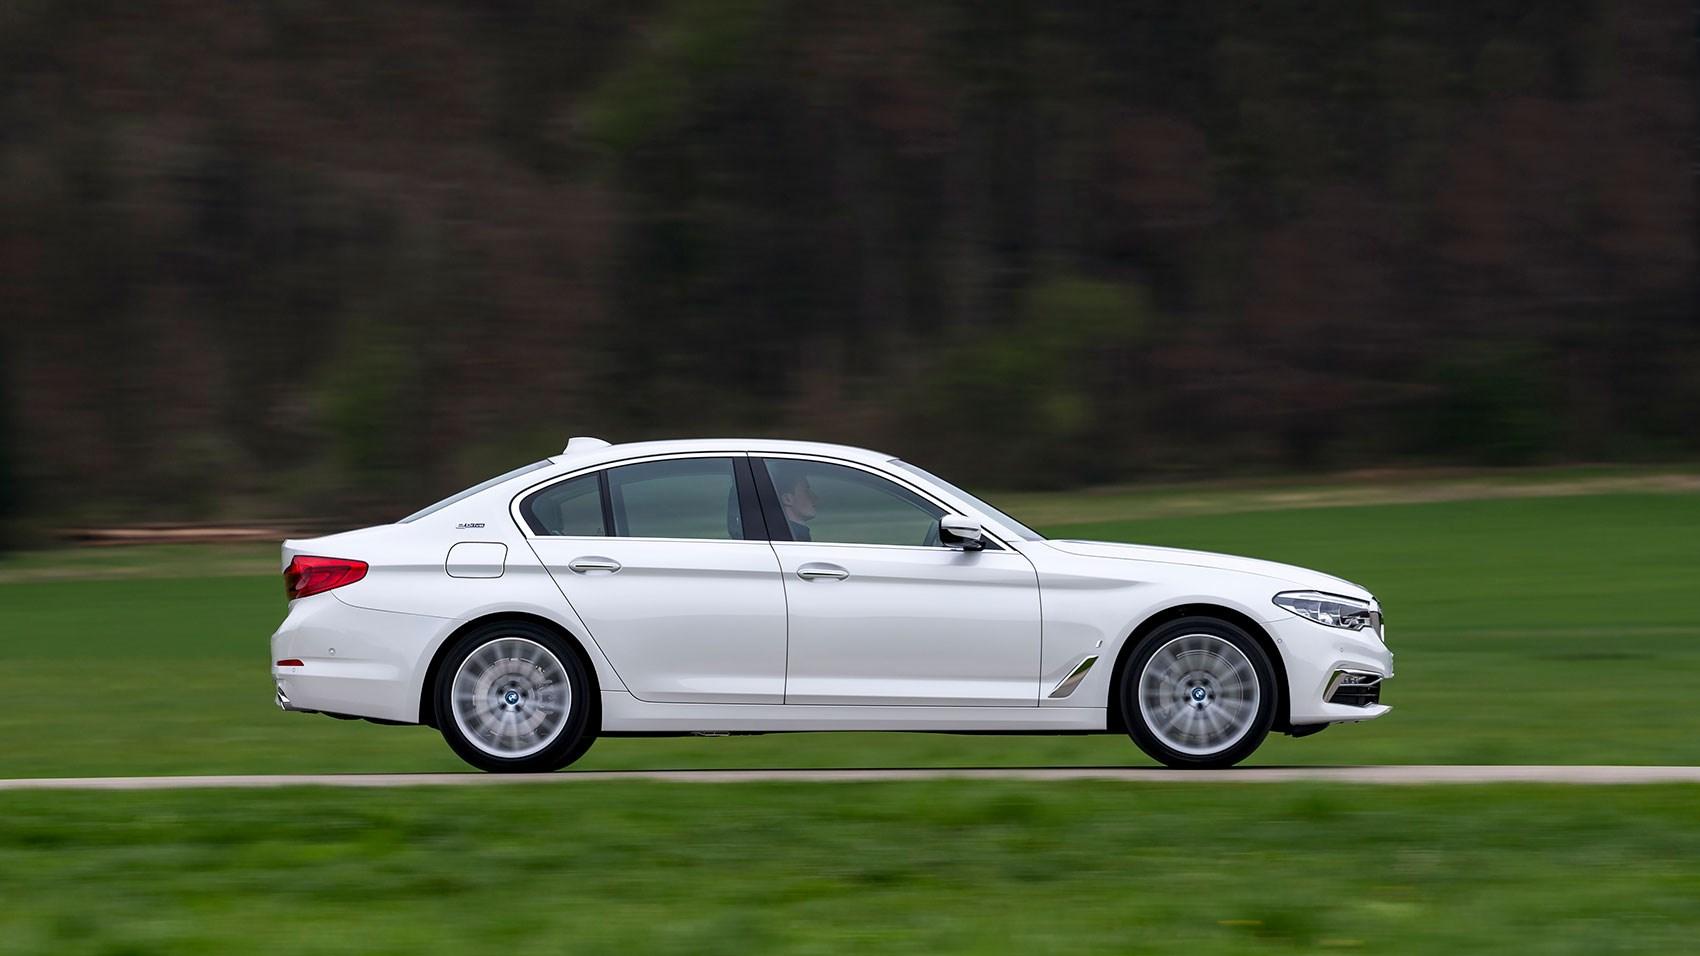 Bmw 530e Iperformance Plug In Hybrid 2017 Review Car Magazine